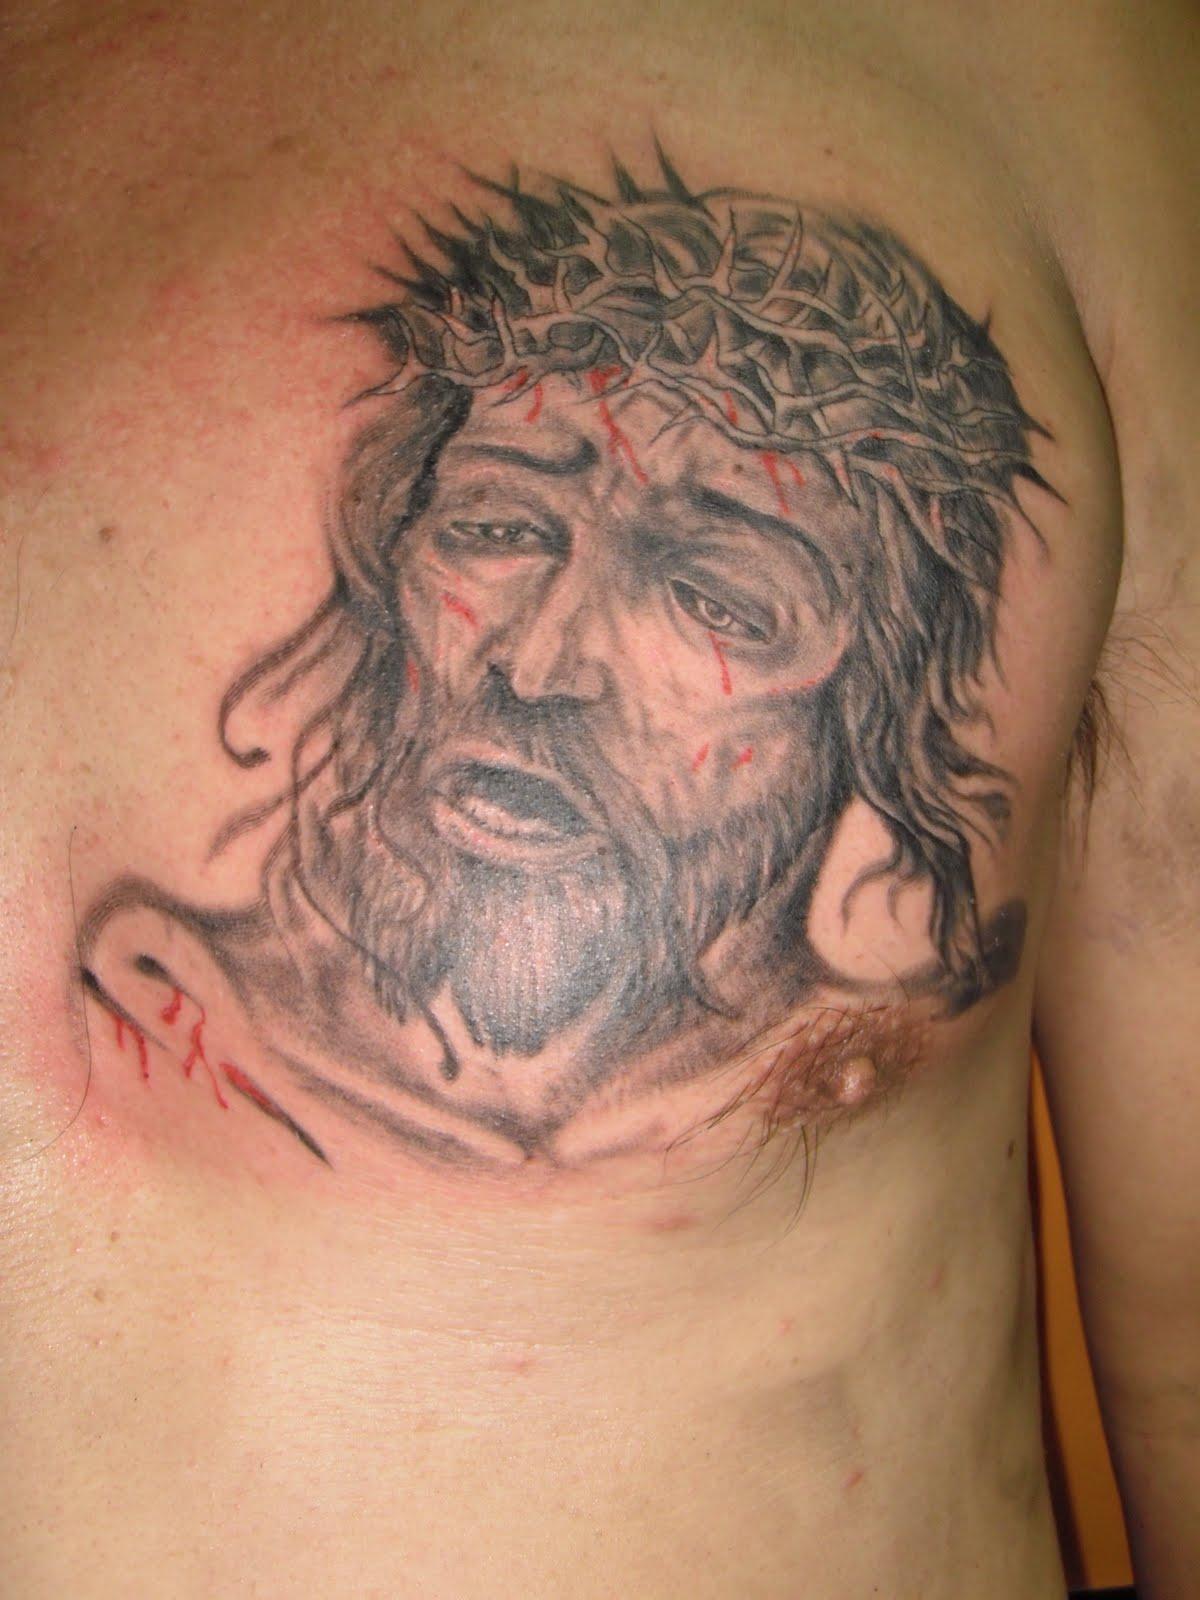 Tattoo Ideas Christian: Andriaj89: Wonderful Christian Tattoos Designs